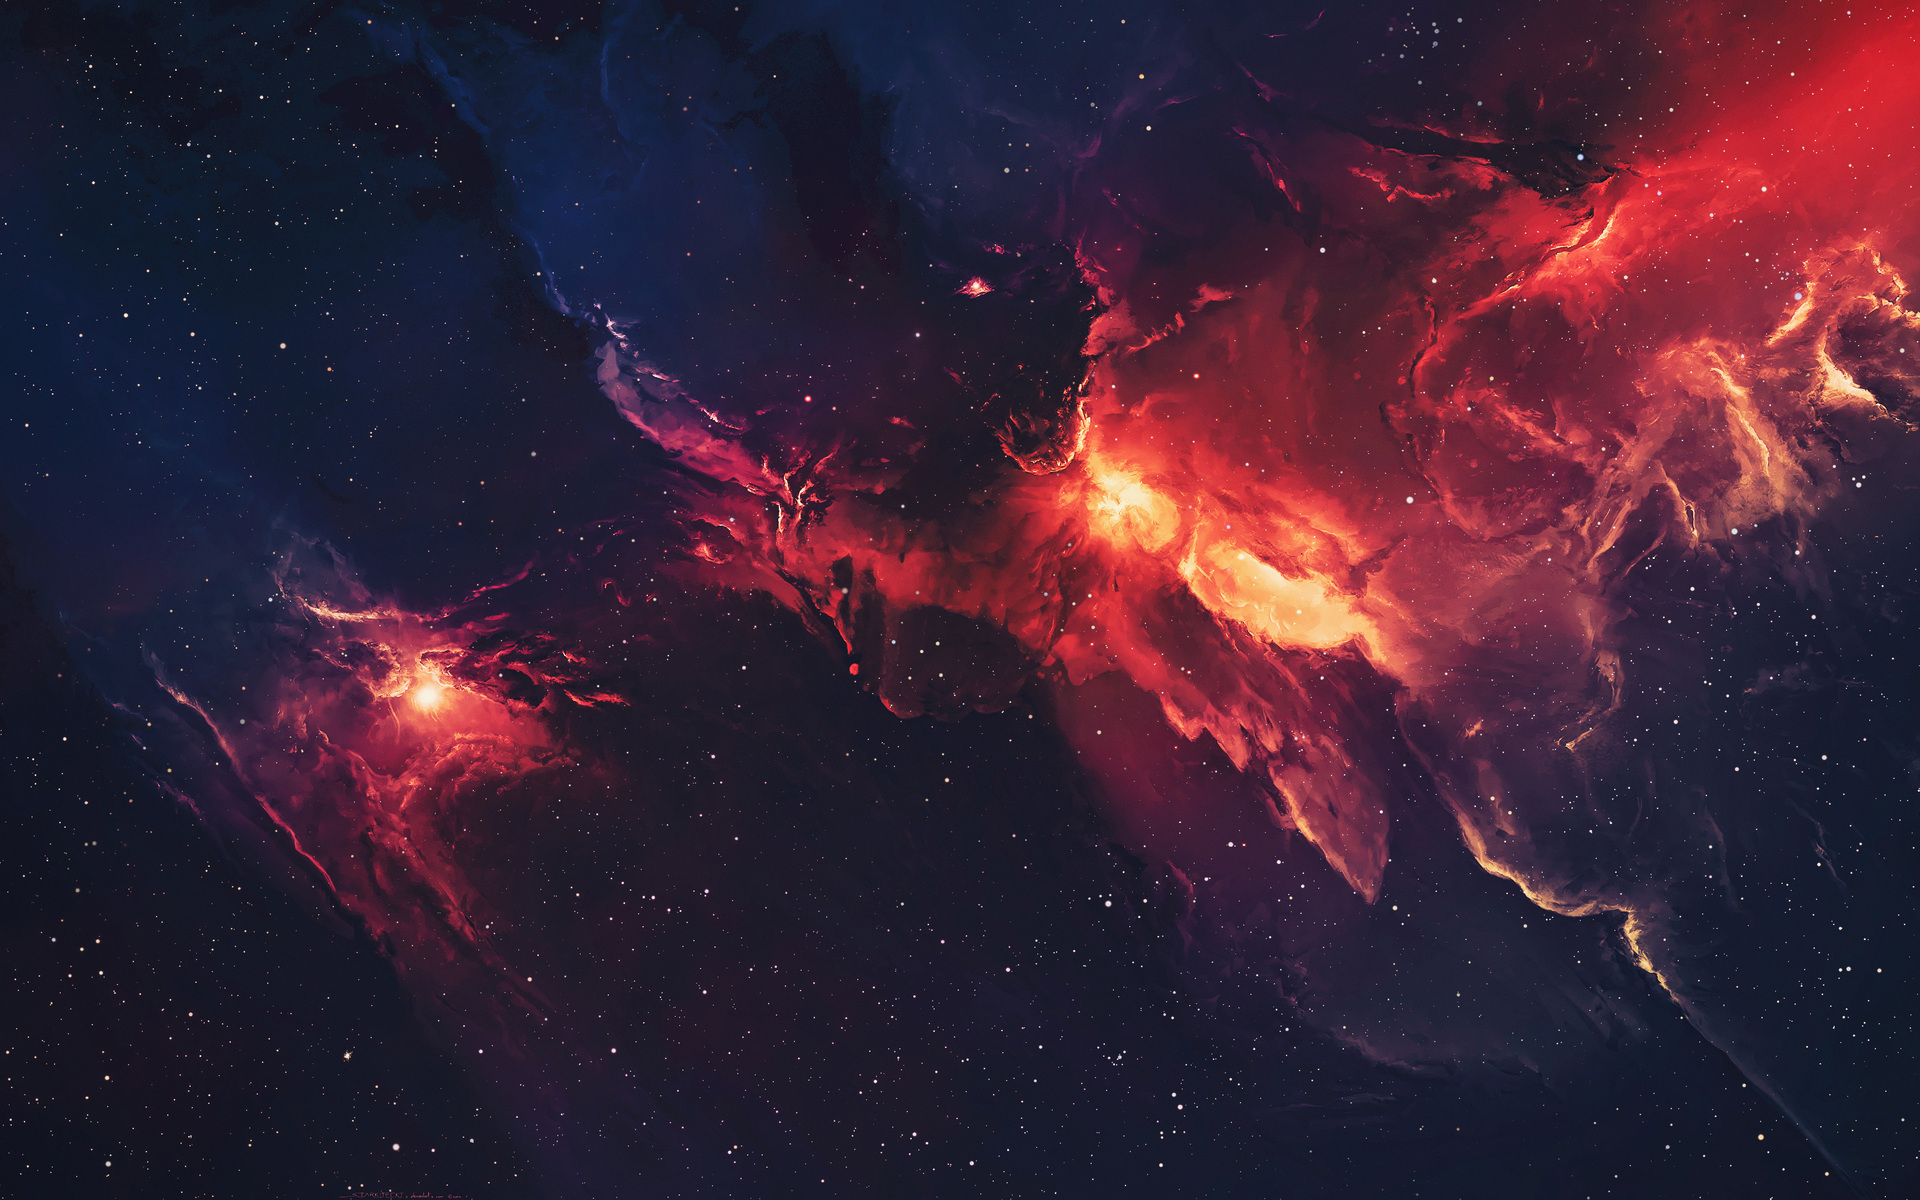 galaxy-space-stars-universe-nebula-4k-qw.jpg